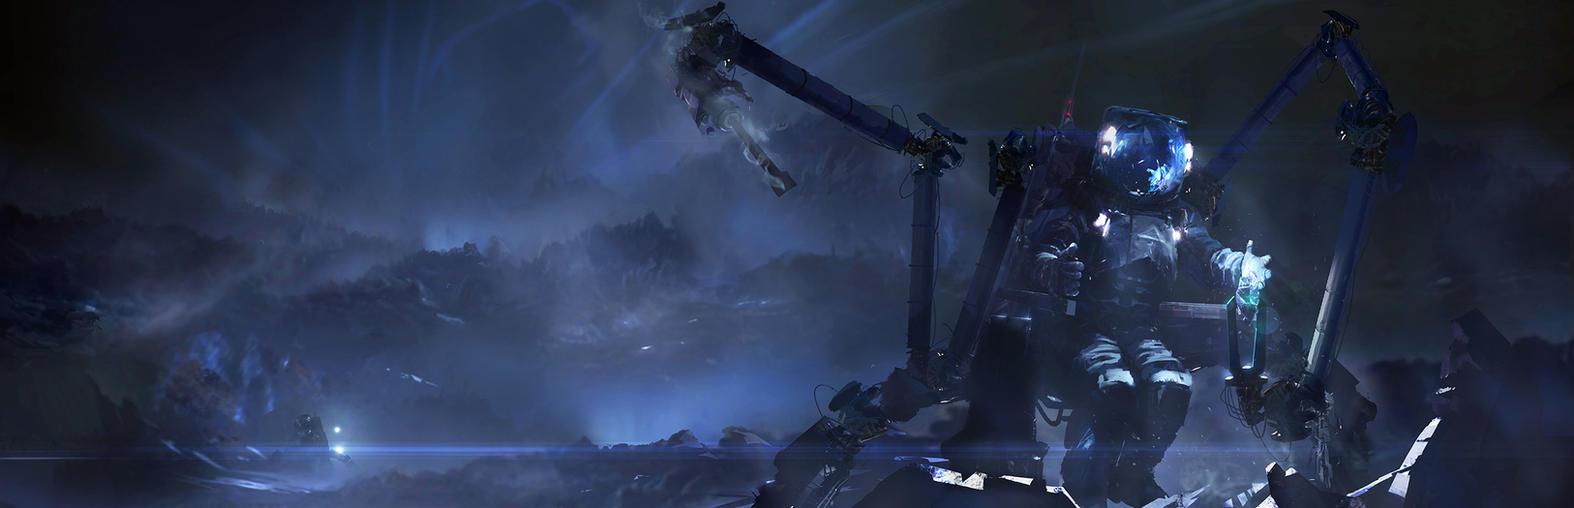 Comet explorer by tnounsy